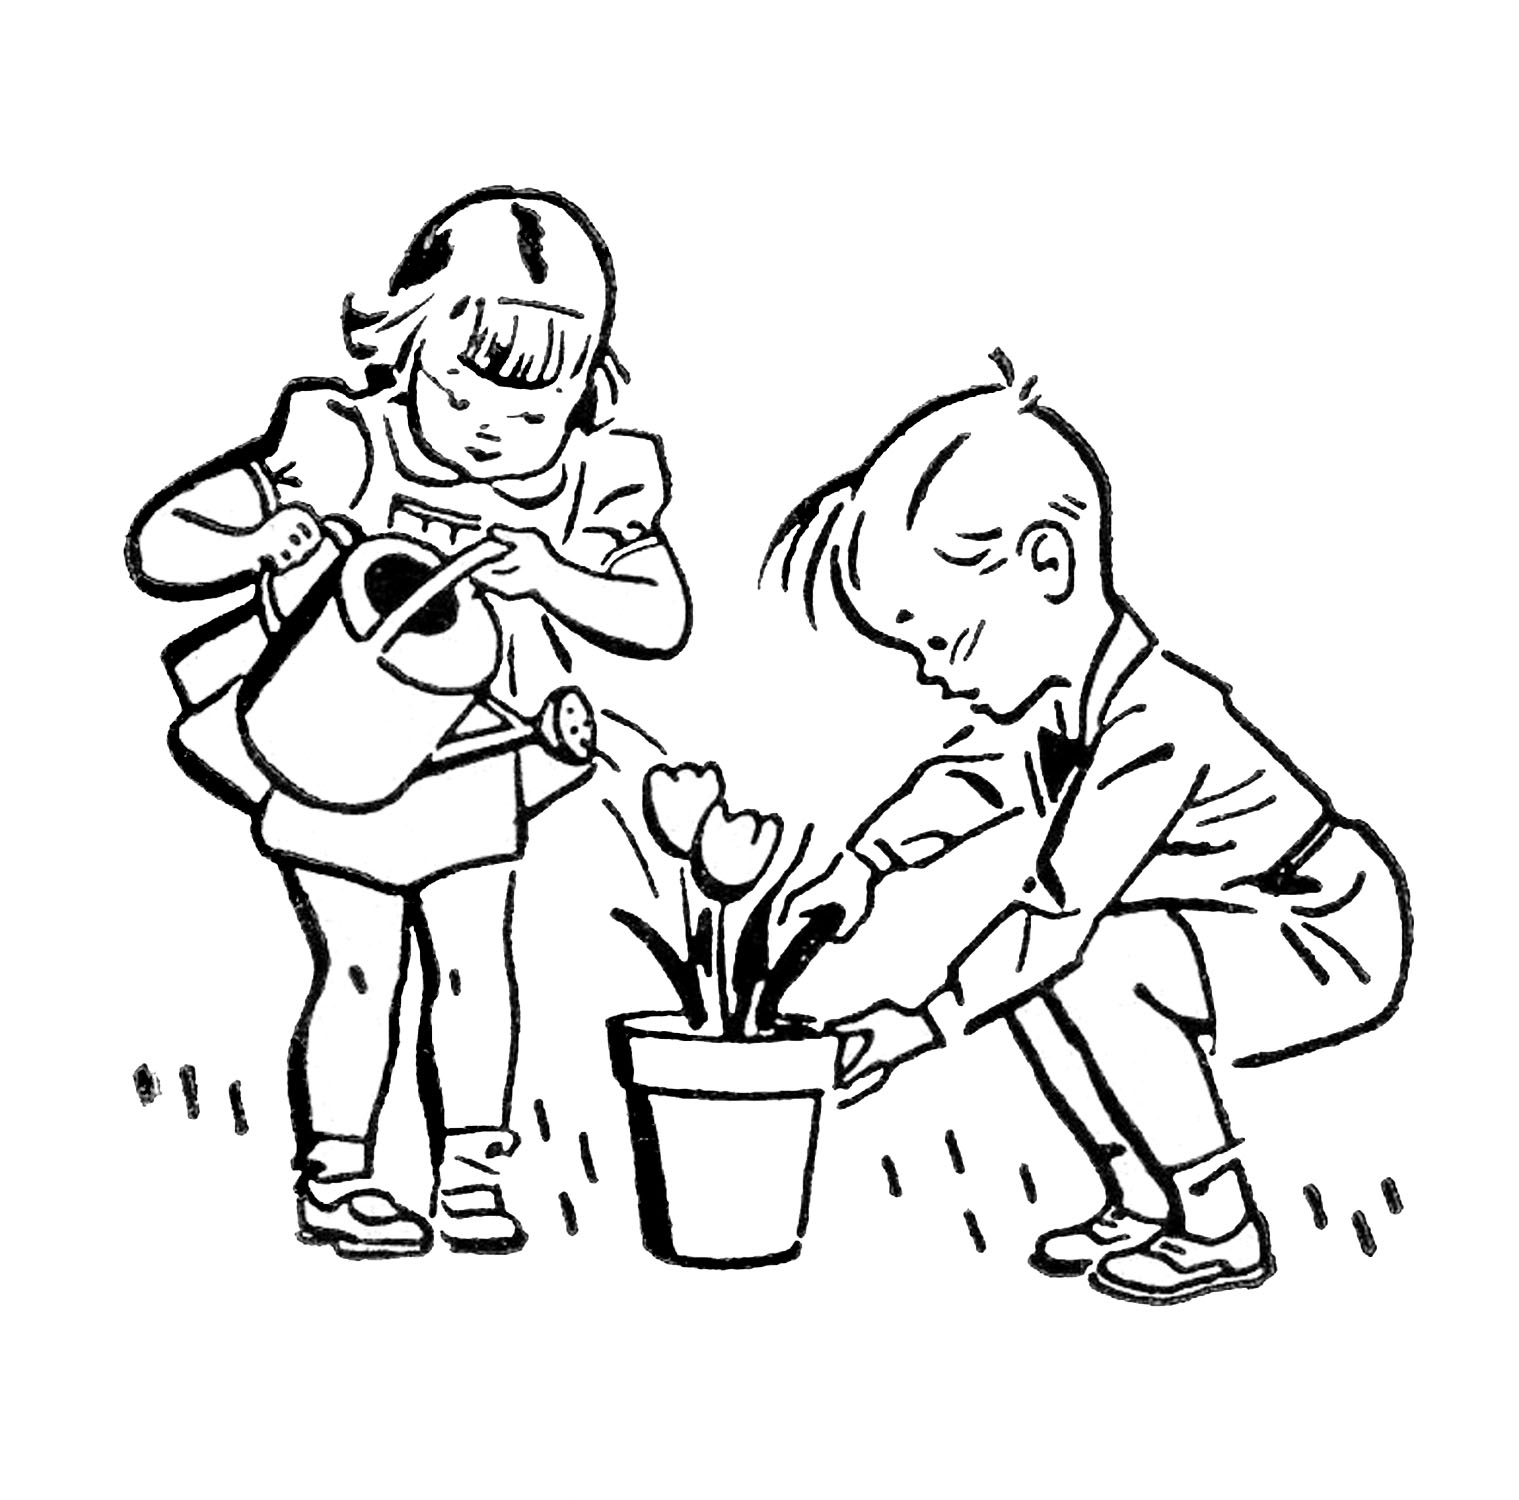 Retro Images Cute Kids Gardening Fishing Playing The